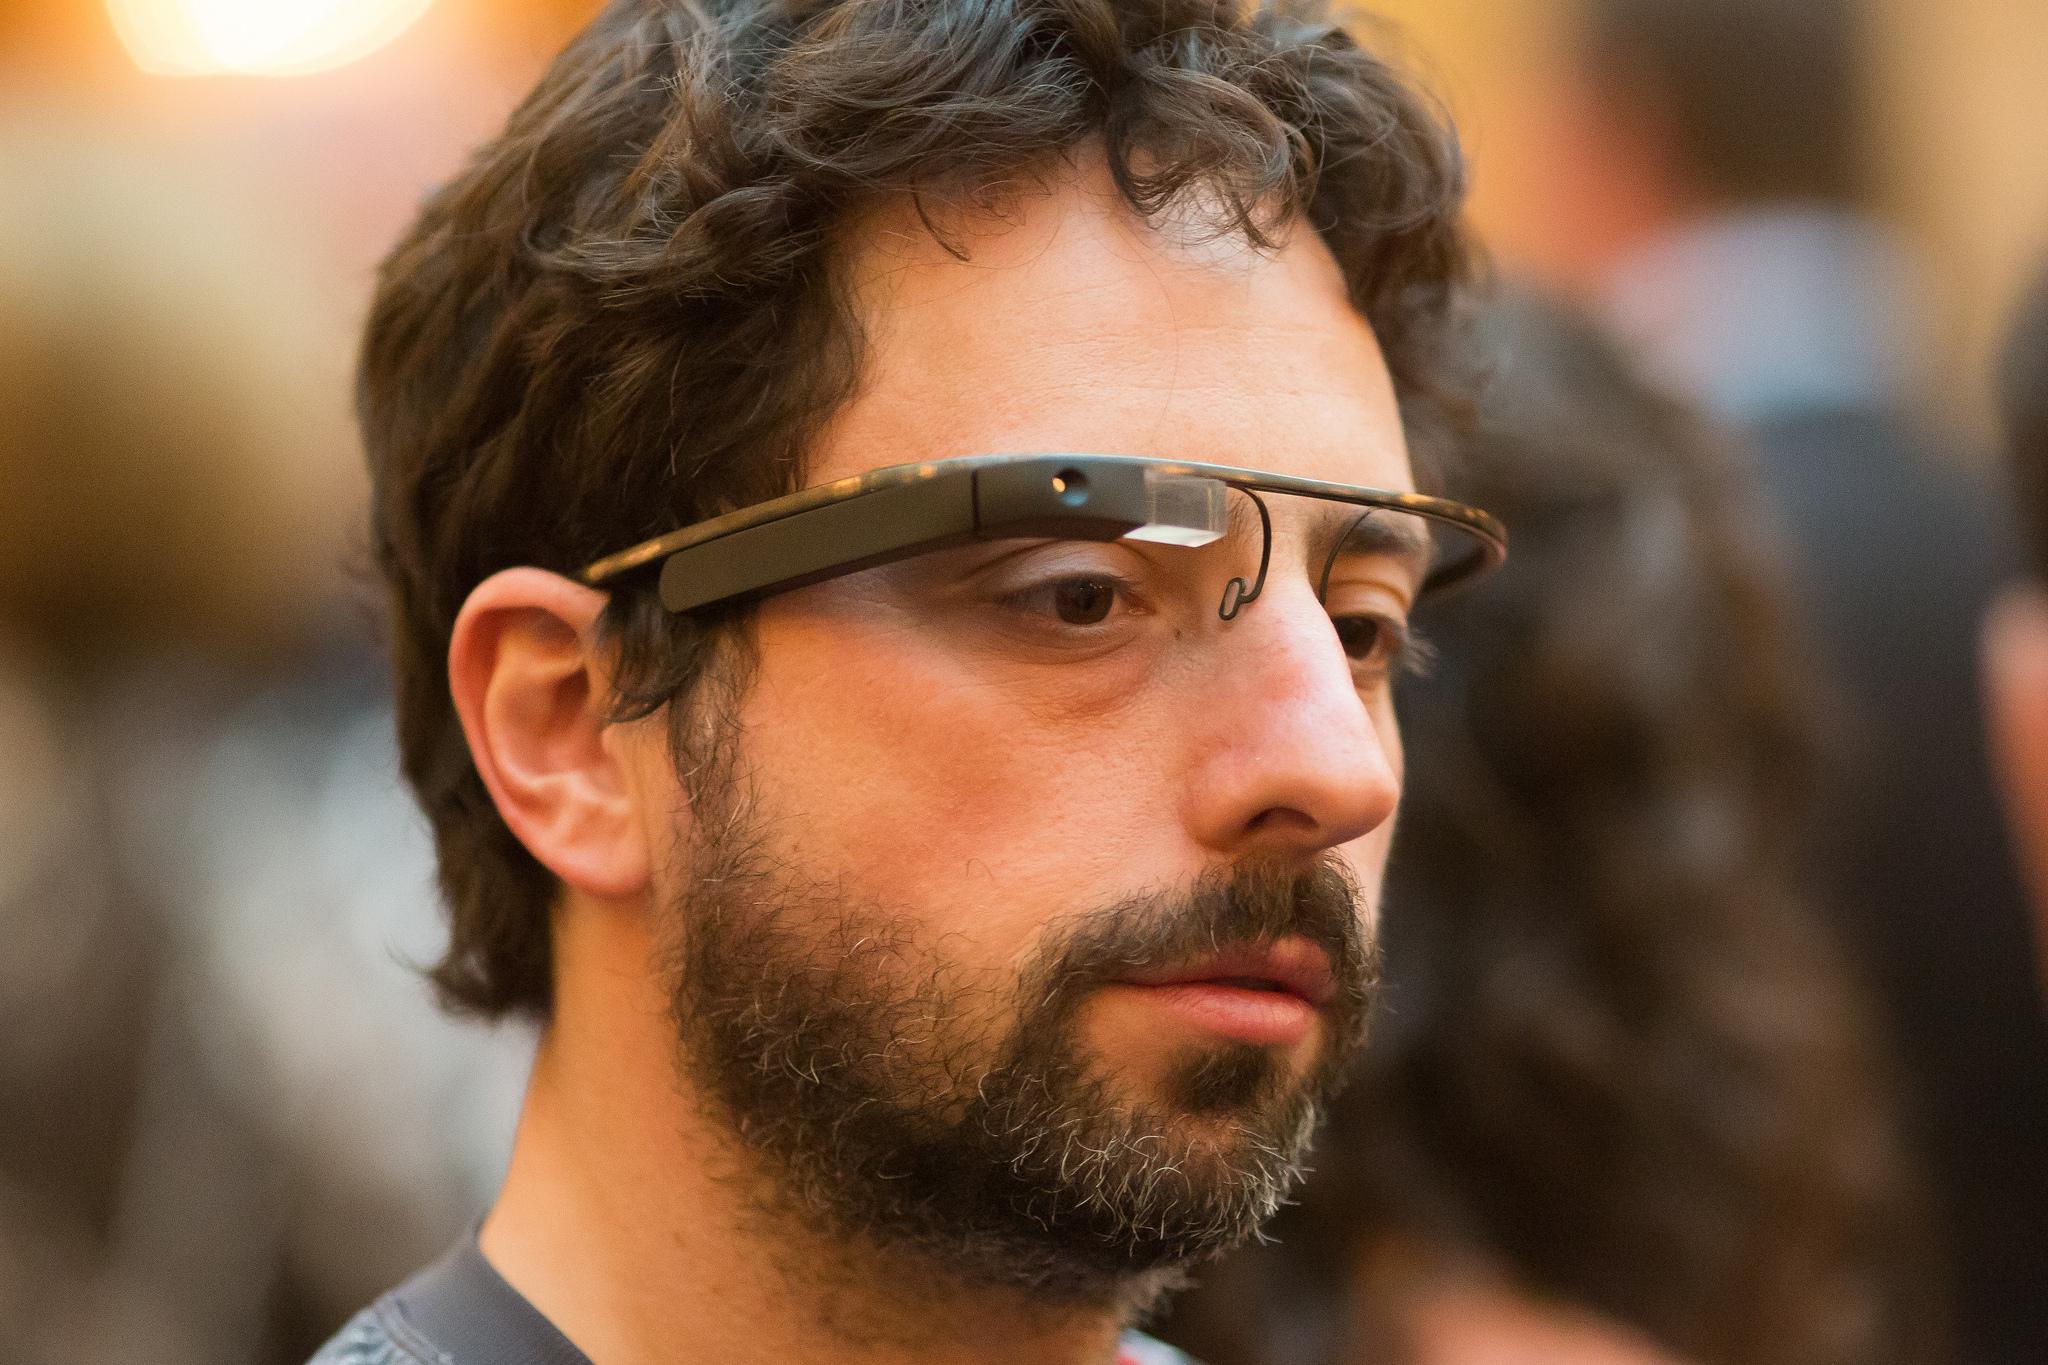 Google cofounder Sergey Brin sports his ever present Google Glass.